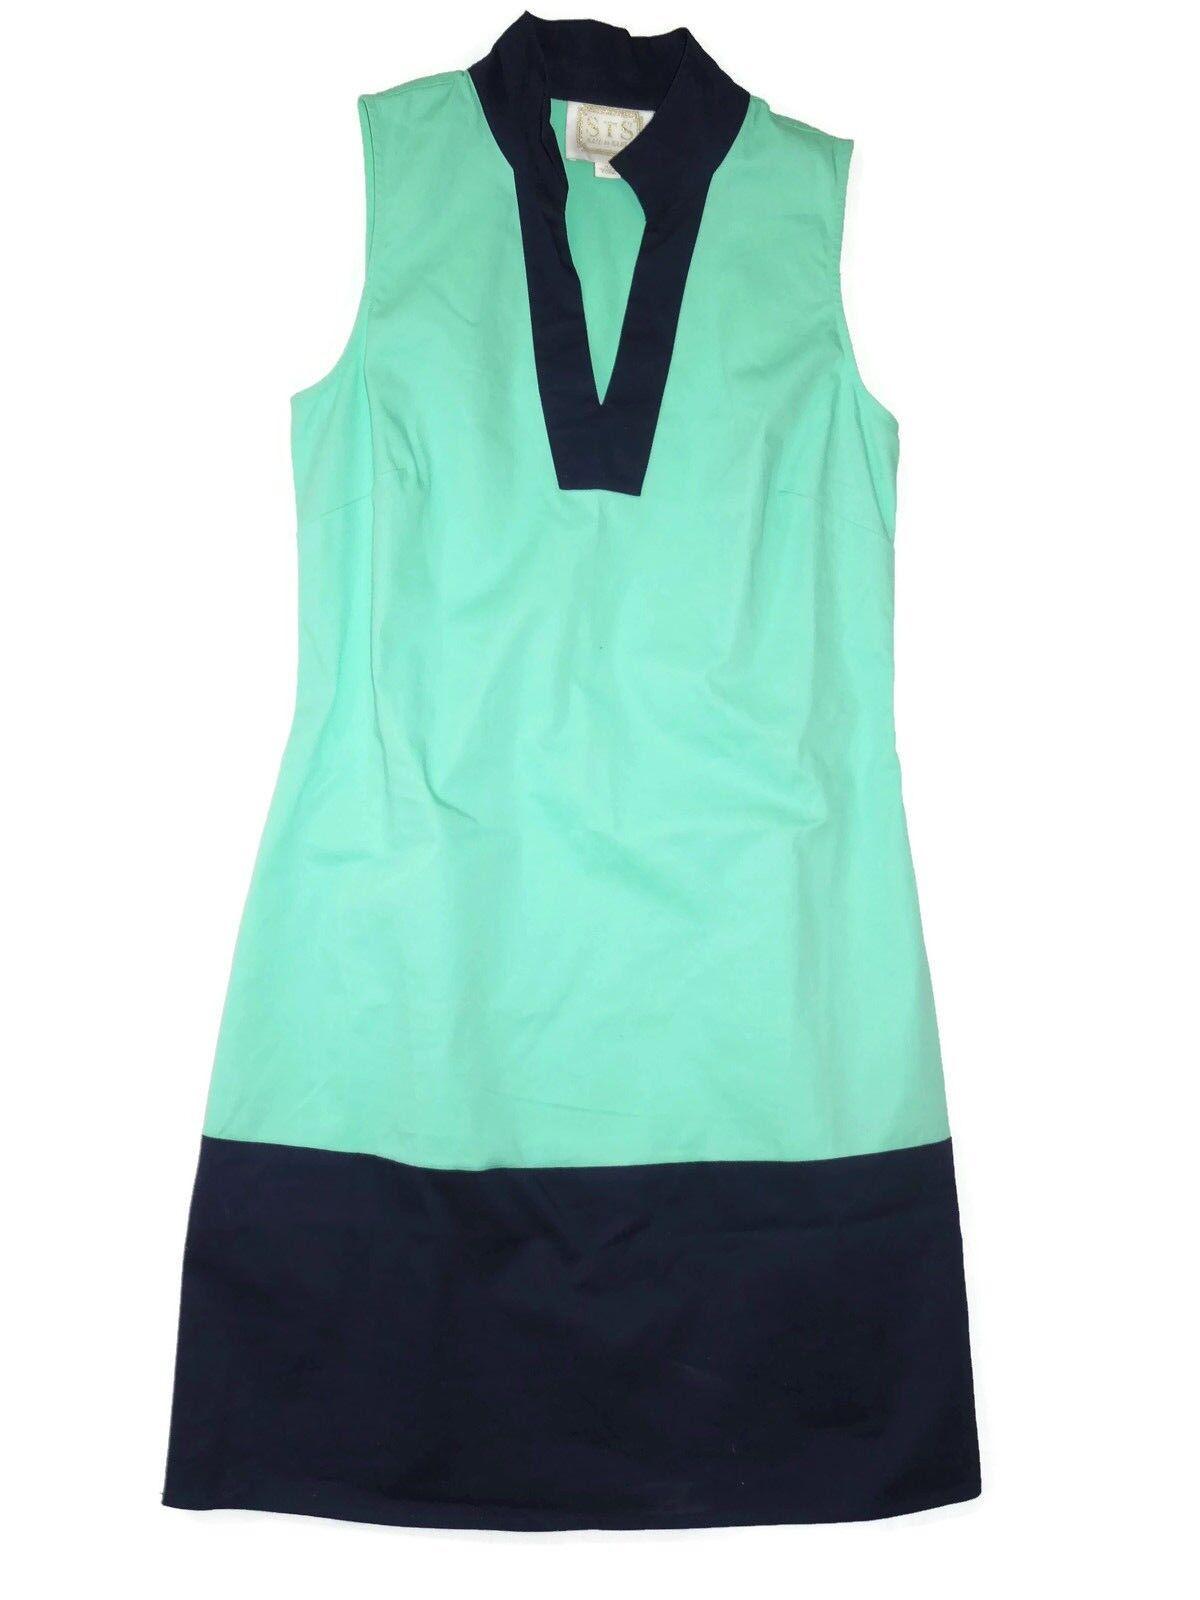 Sail to Sable  classic sleeveless sheath dress Größe XS retail  aqua & navy